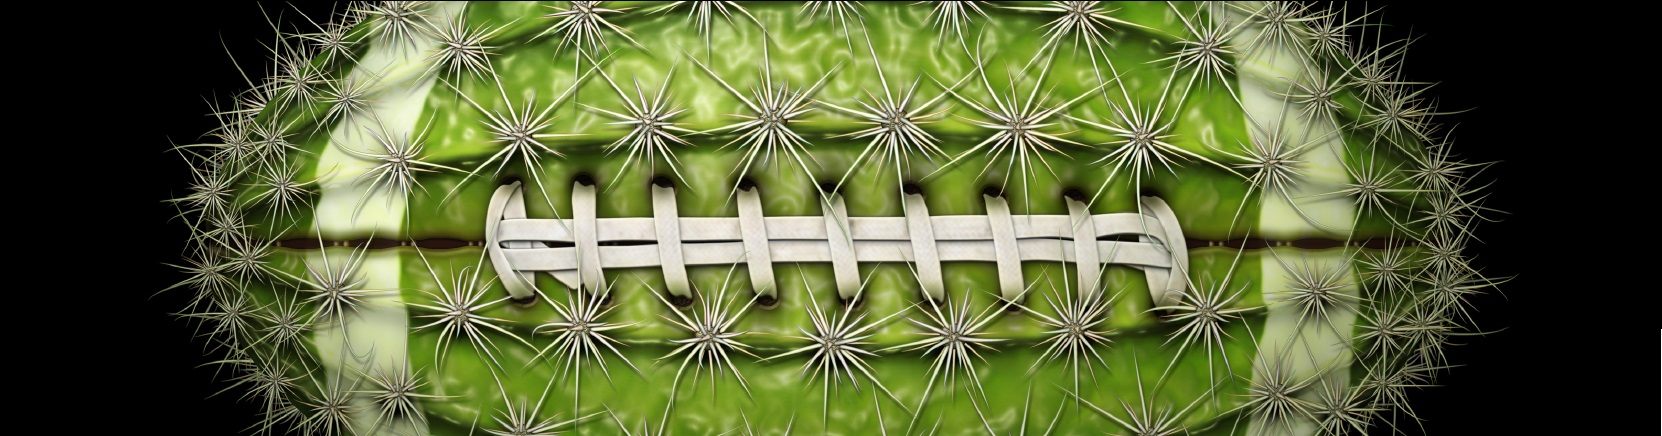 Fiesta/Cactus Bowls